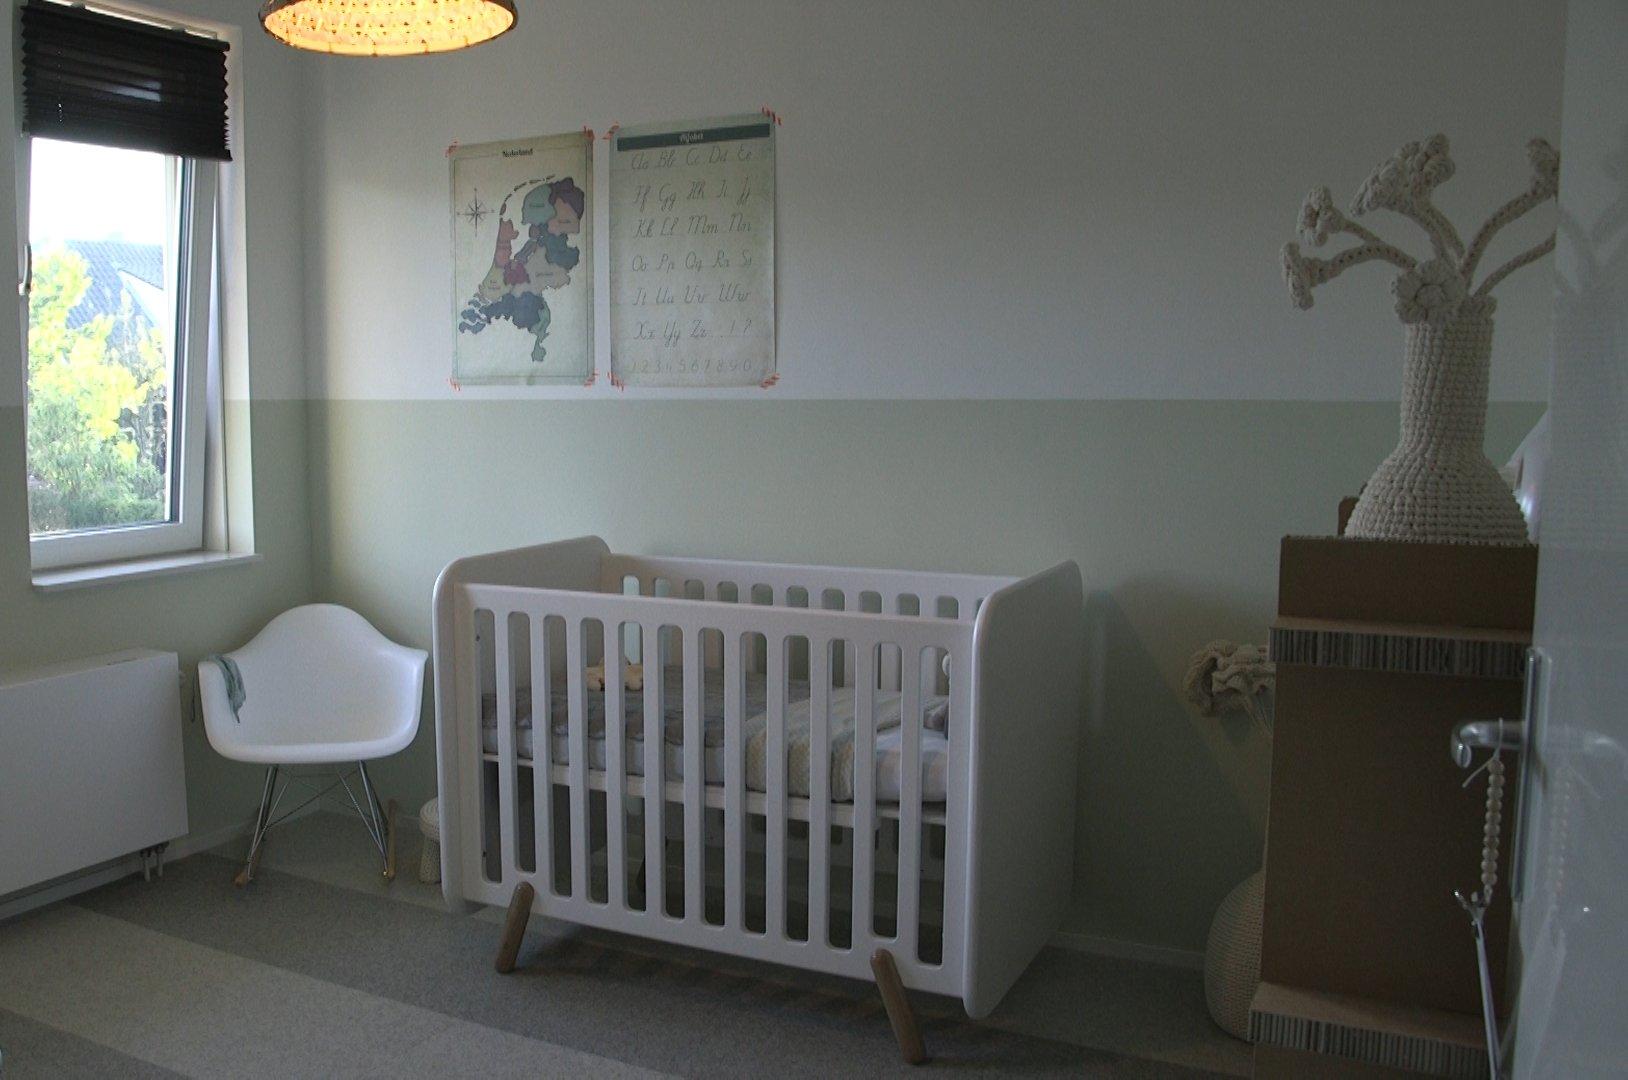 Groene Kinderkamer Ideeen : Gallery of behang woonkamer ideeen interieur behang woonkamer